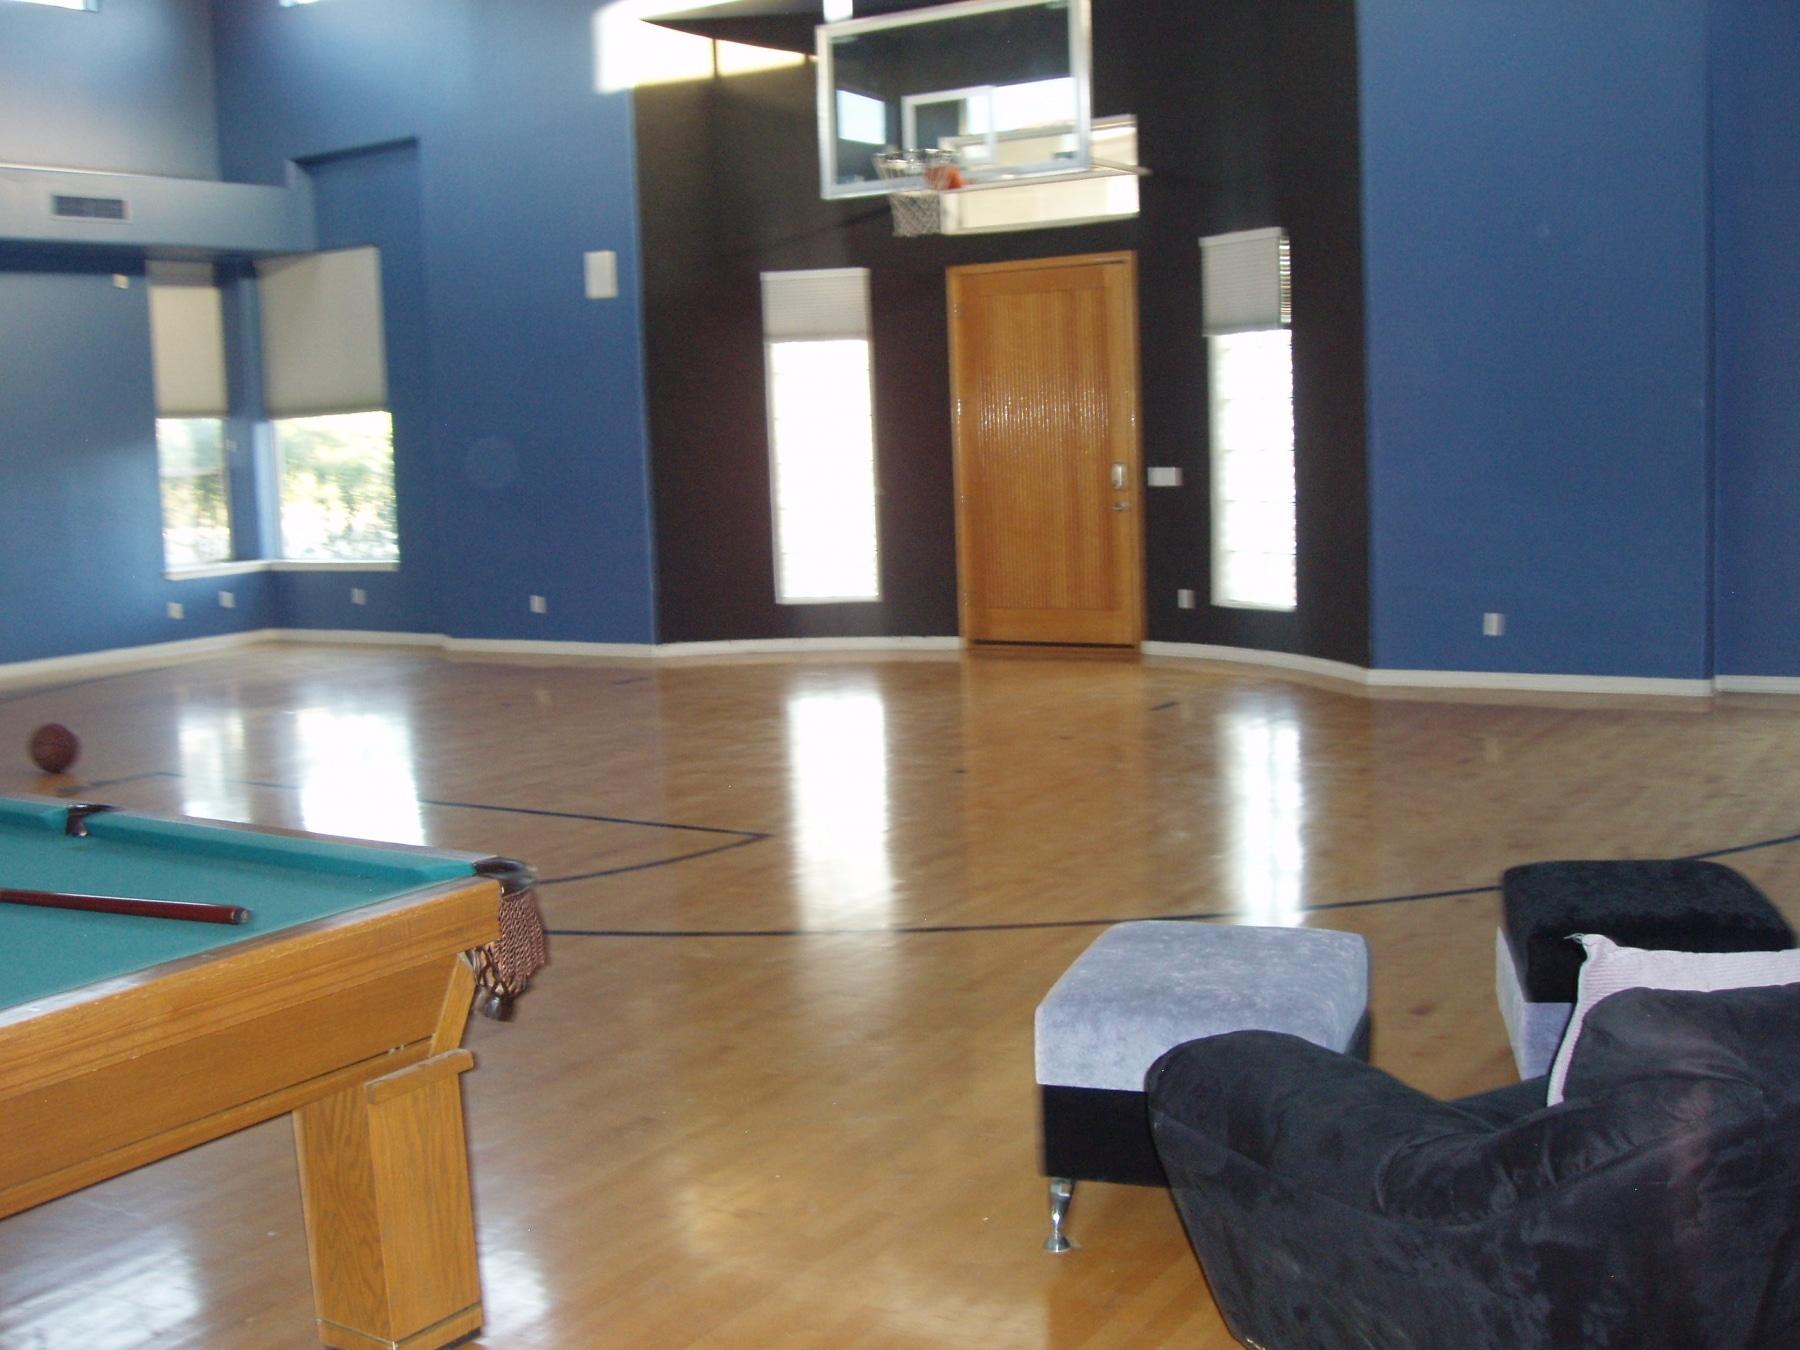 phoenix arizona indoor basketball court